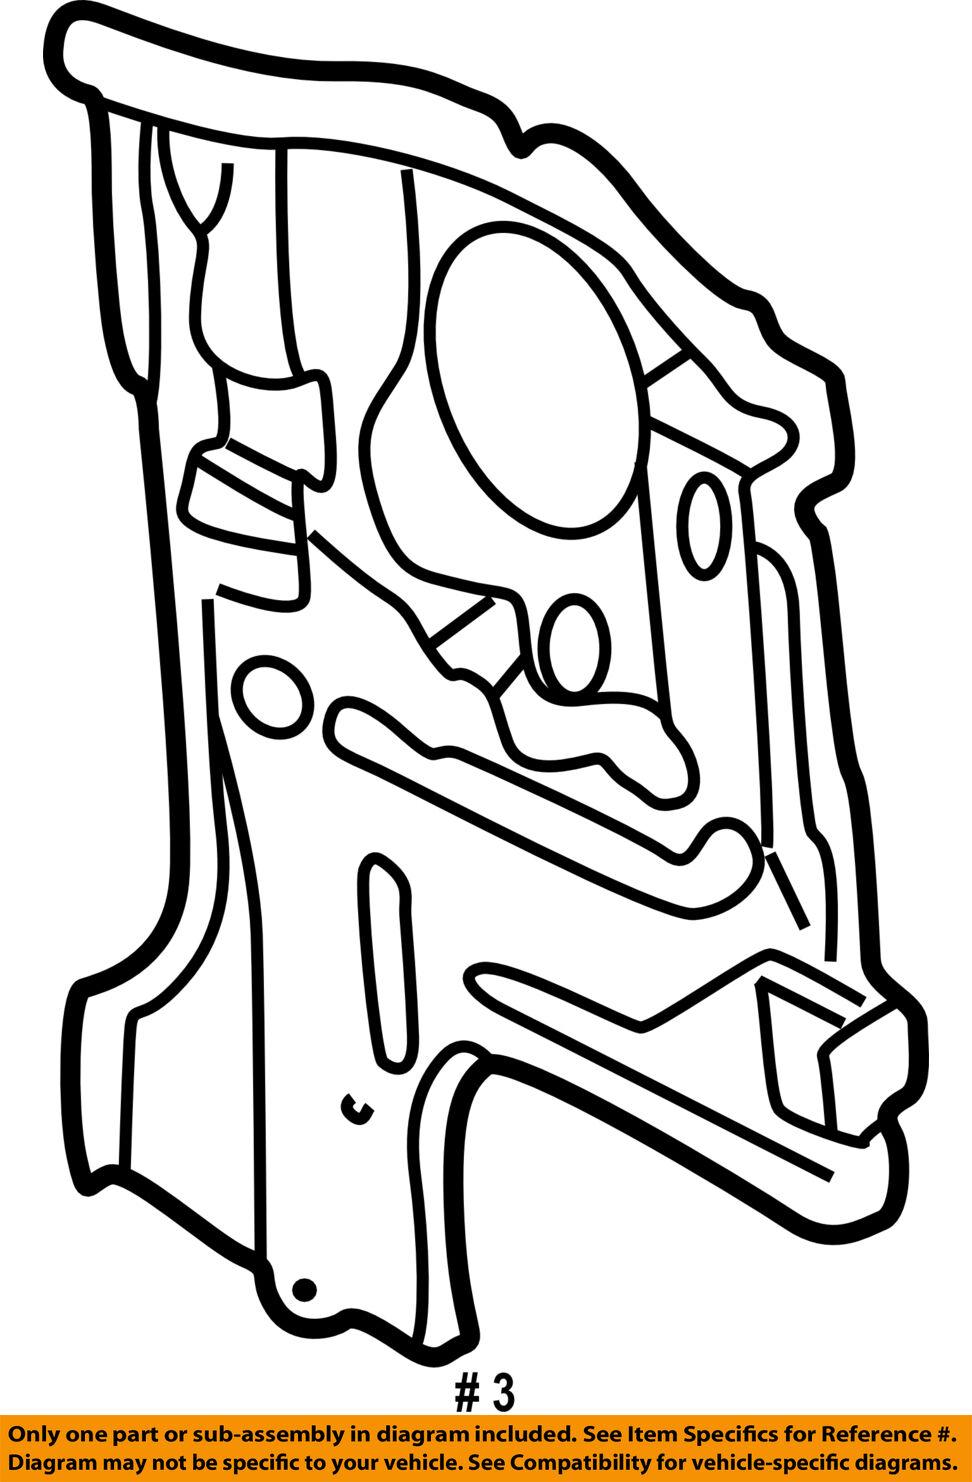 tan xterra wiring diagram database 2004 Xterra Grey nissan xterra 02 04 radiator support lh black steel ni1225151 ebay yellow xterra norton secured powered